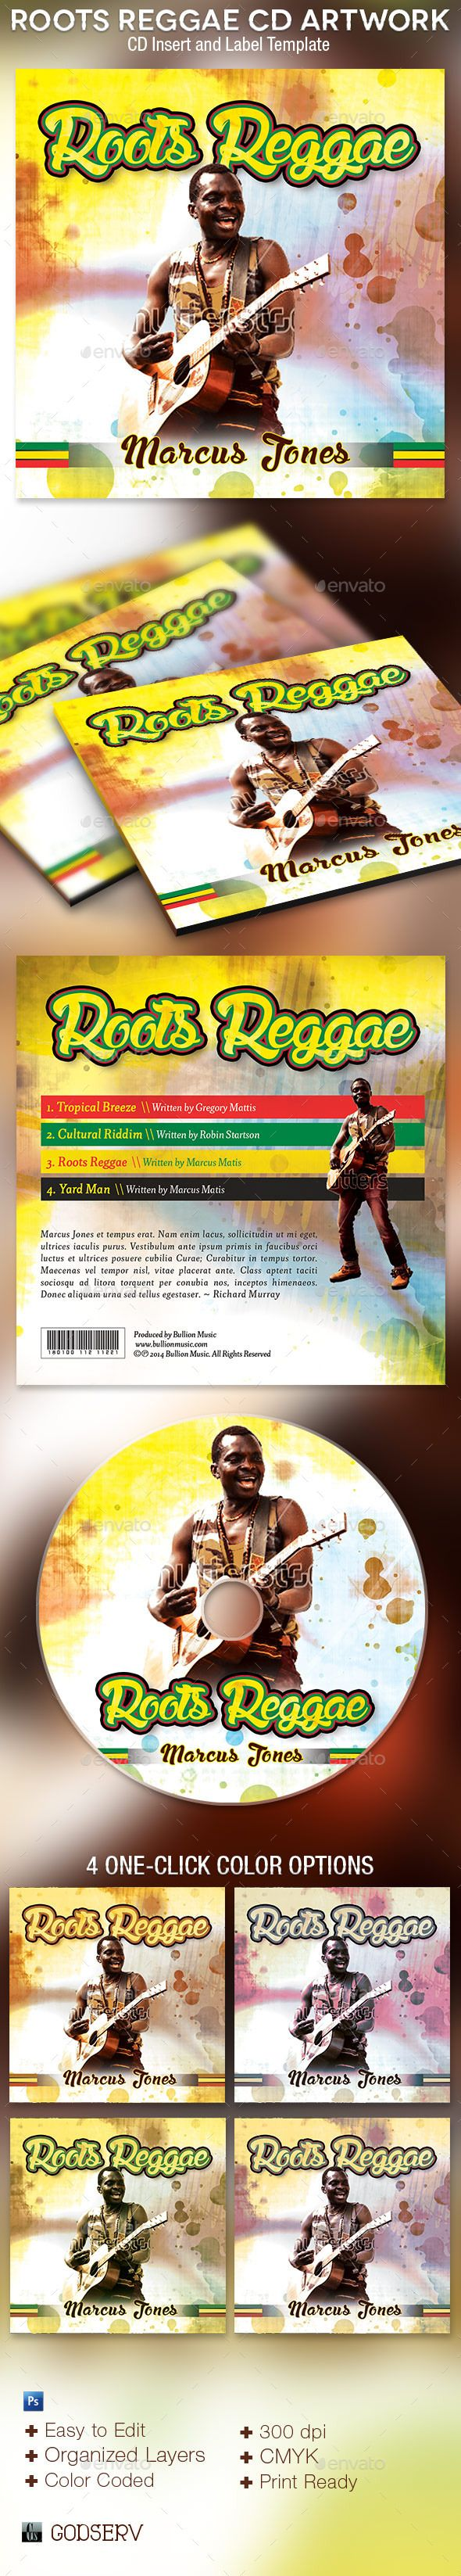 Roots Reggae CD Artwork Photoshop Template - CD & DVD Artwork Print Templates